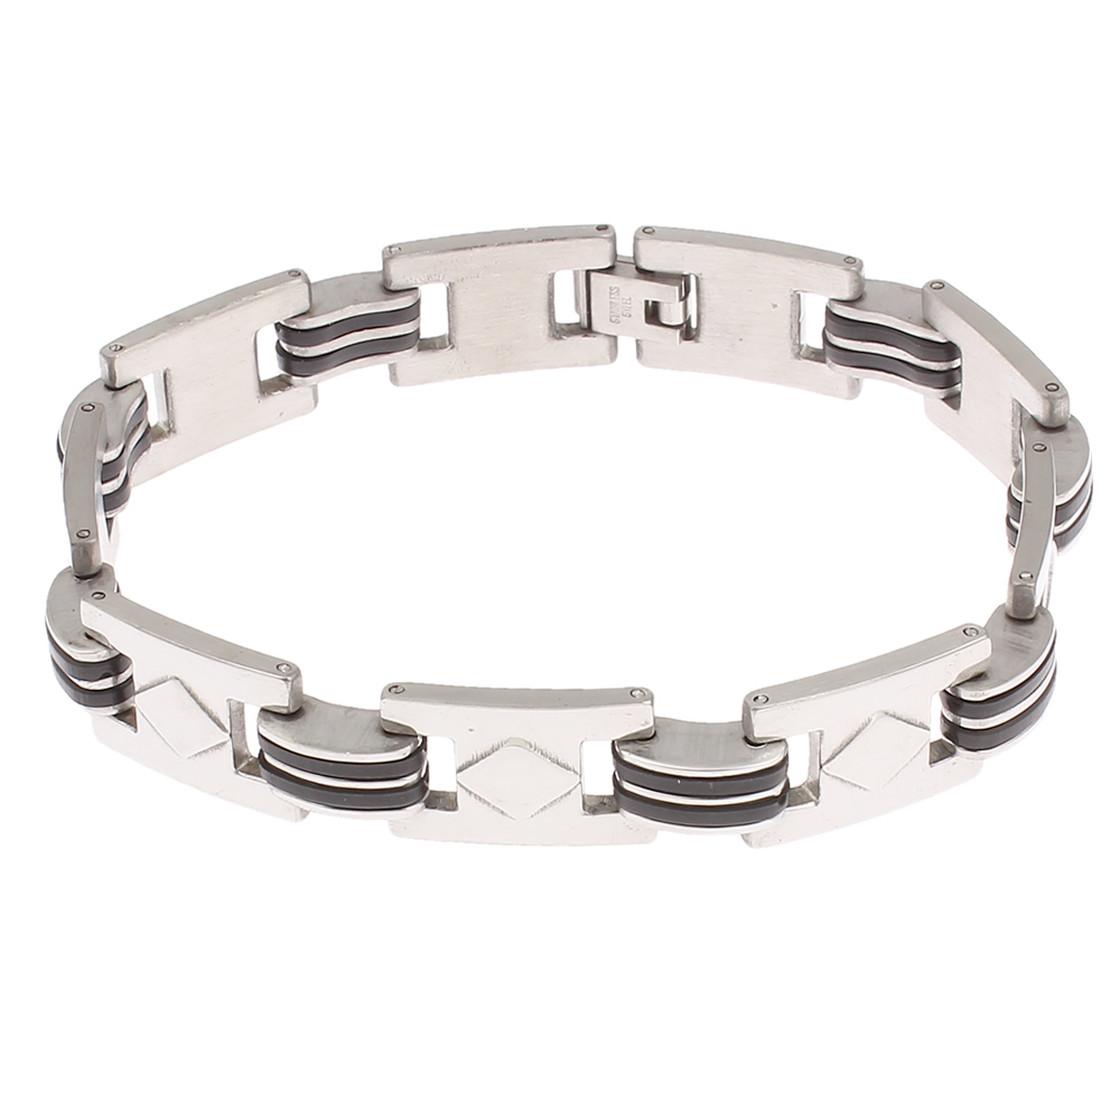 "Damen Design /""Fantasyarmband/"" Armband Silberfarben Edelstahl"